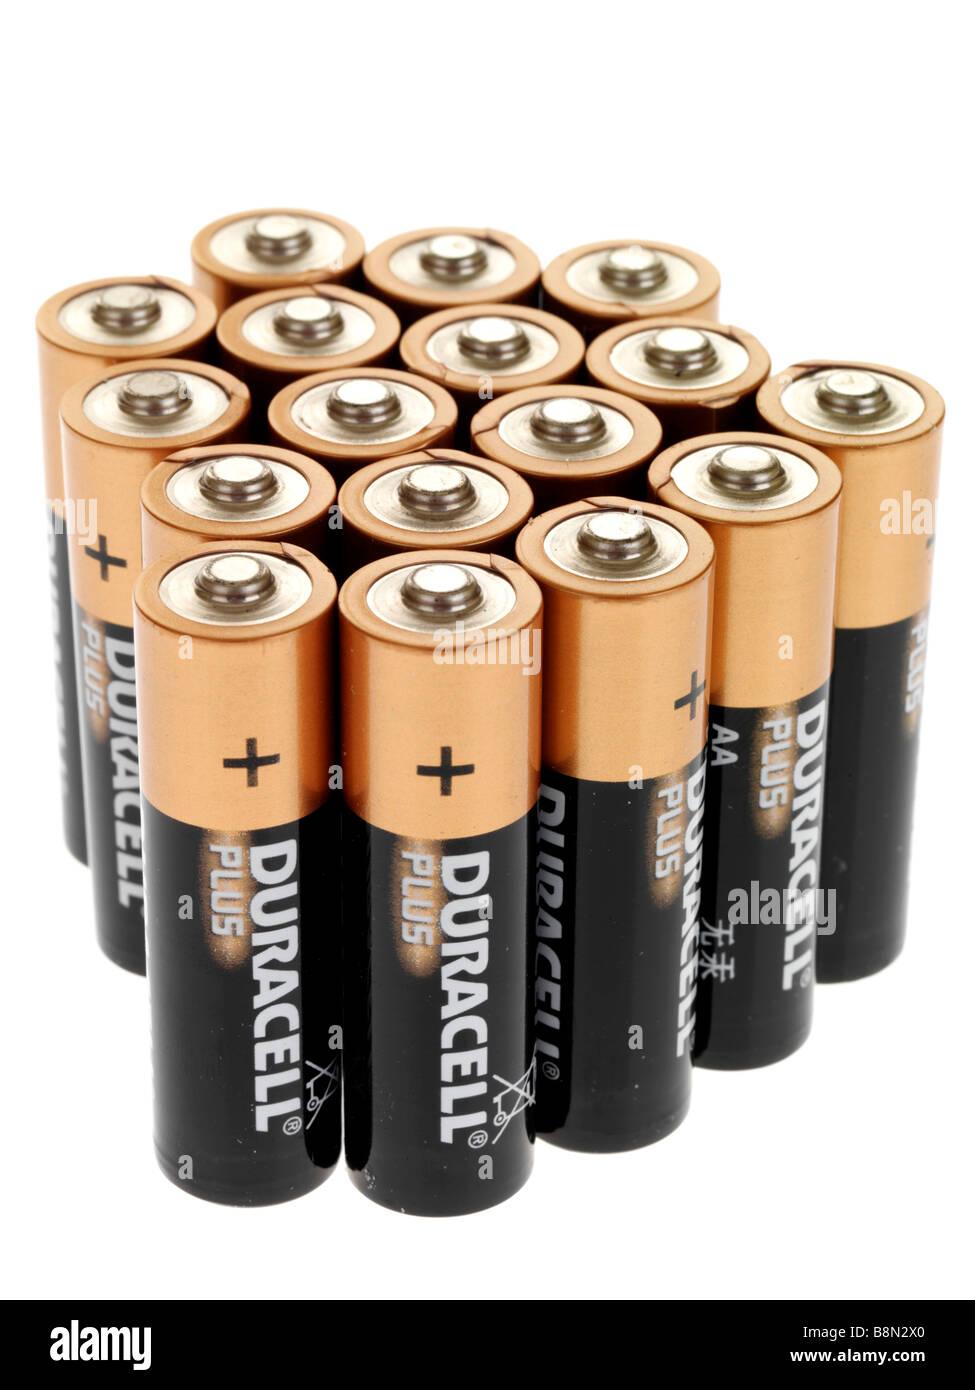 Batteries - Stock Image